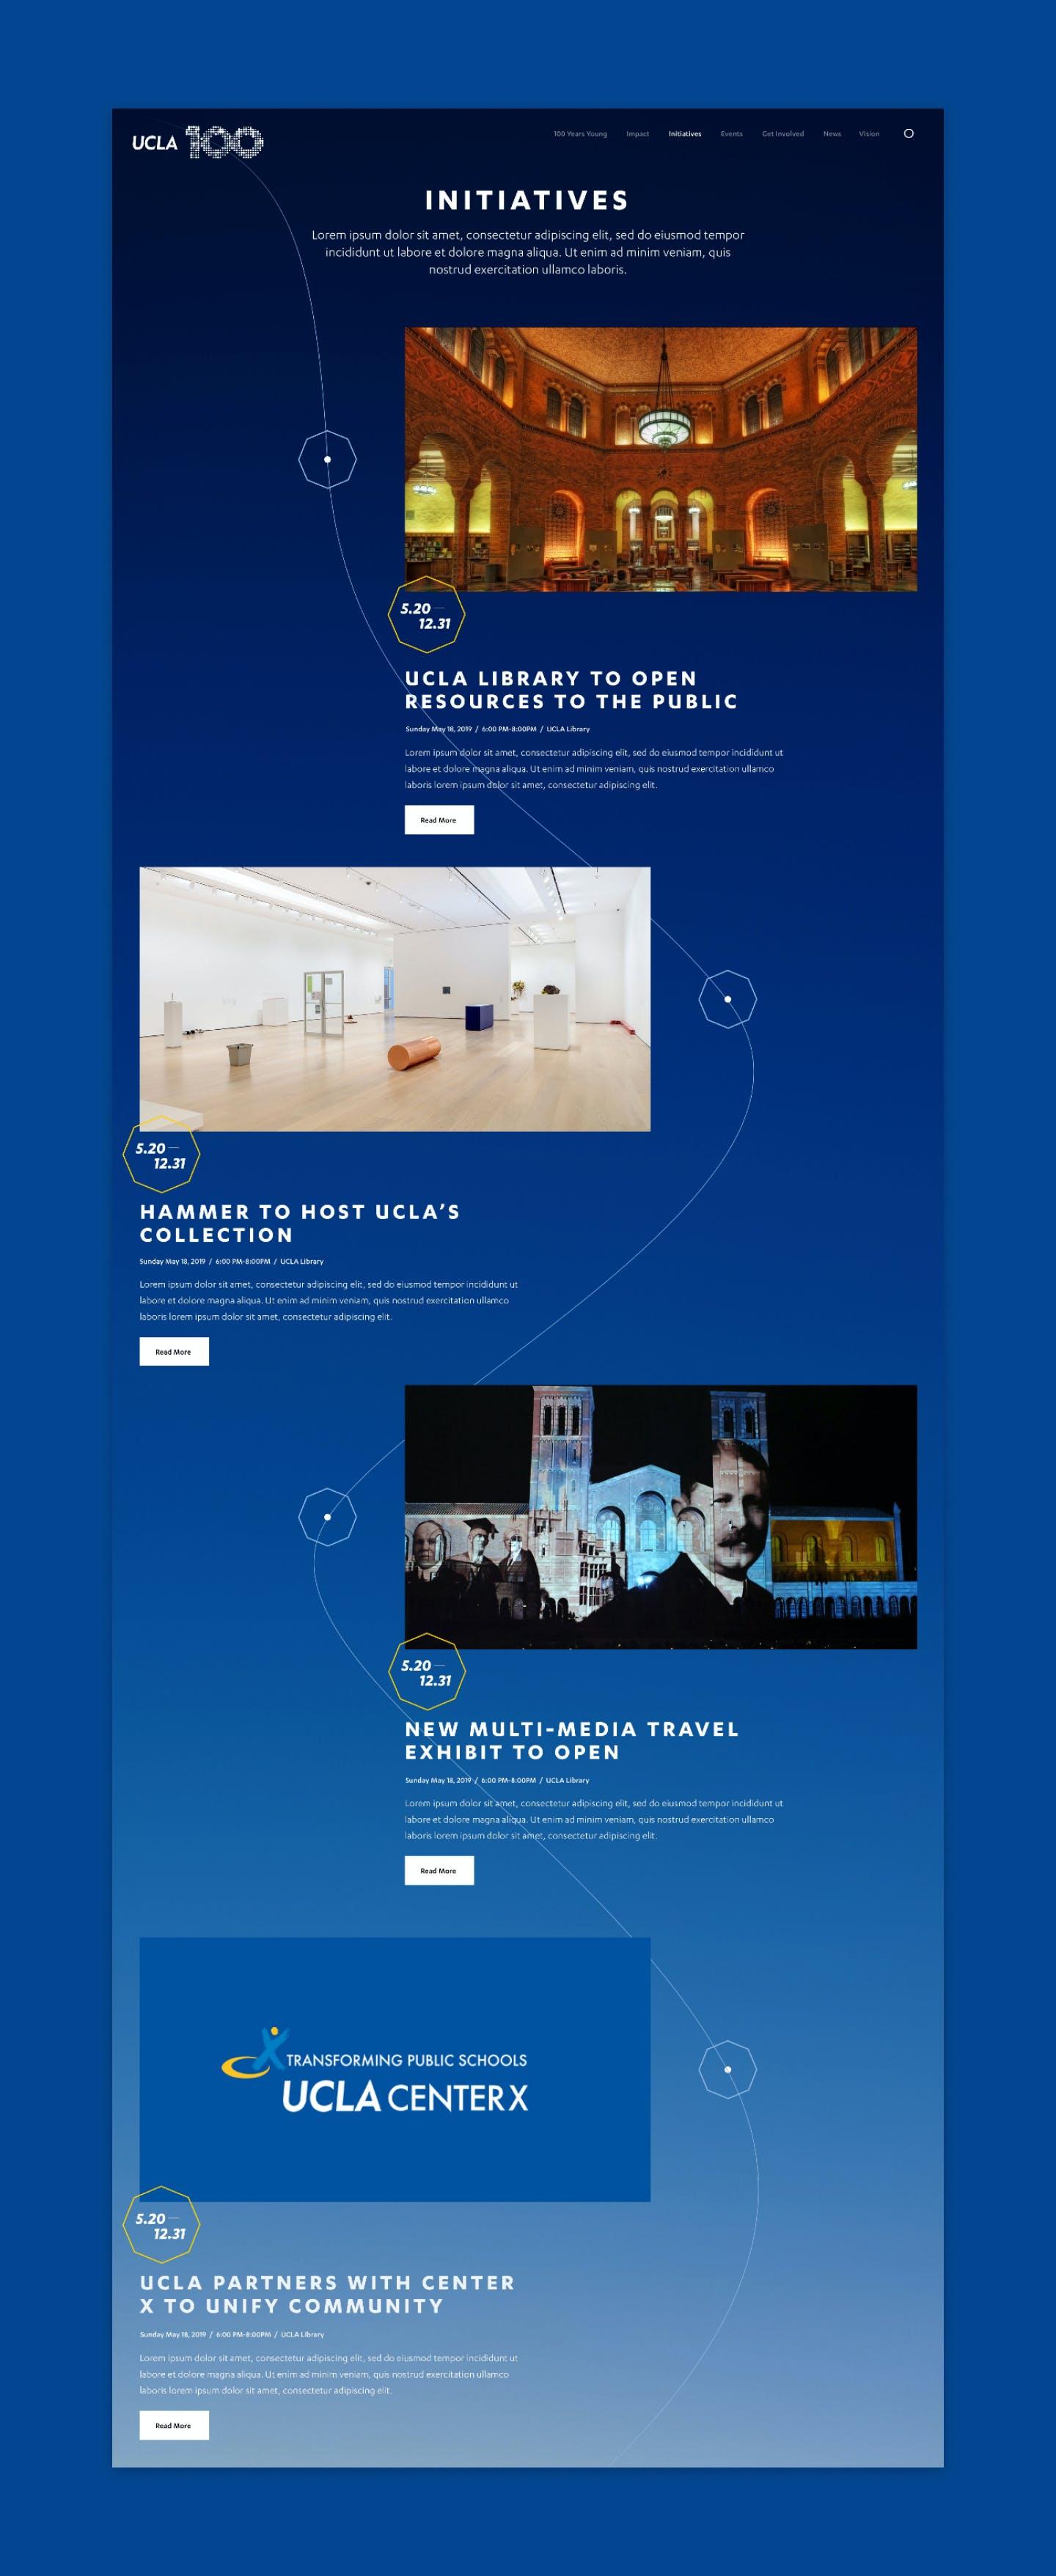 Screenshot of UCLA 100 initiatives page